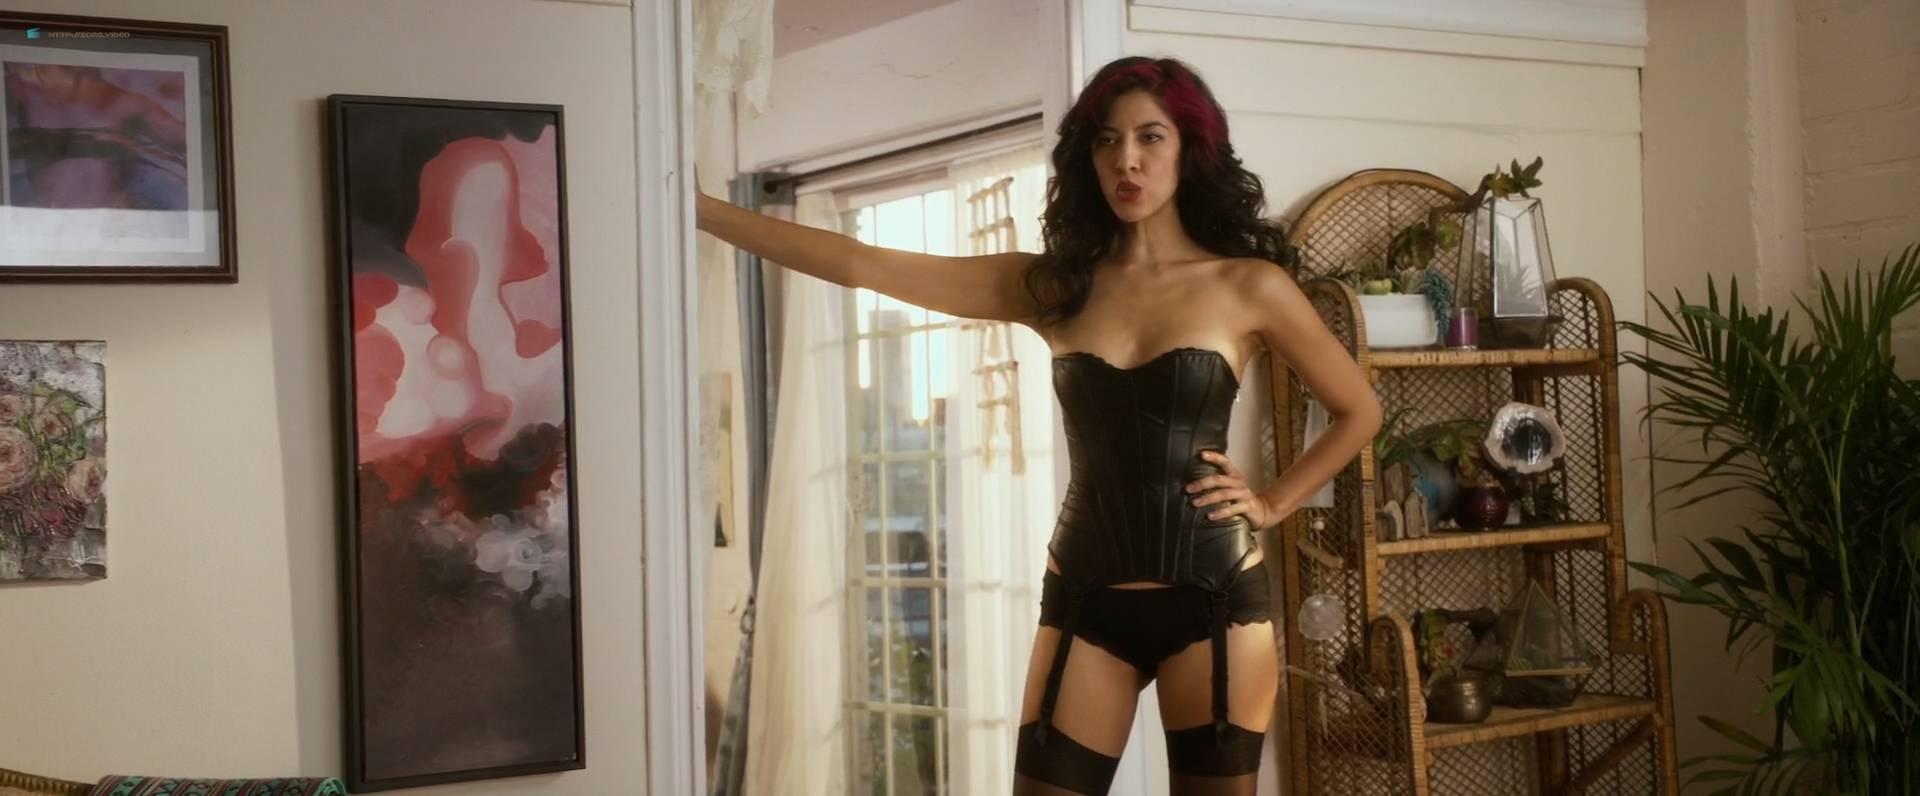 Heather-Graham-nude-sex-Angela-Kinsey-nude-butt-Stephanie-Beatriz-hot-Half-Magic-2018-HD-1080p-013.jpg